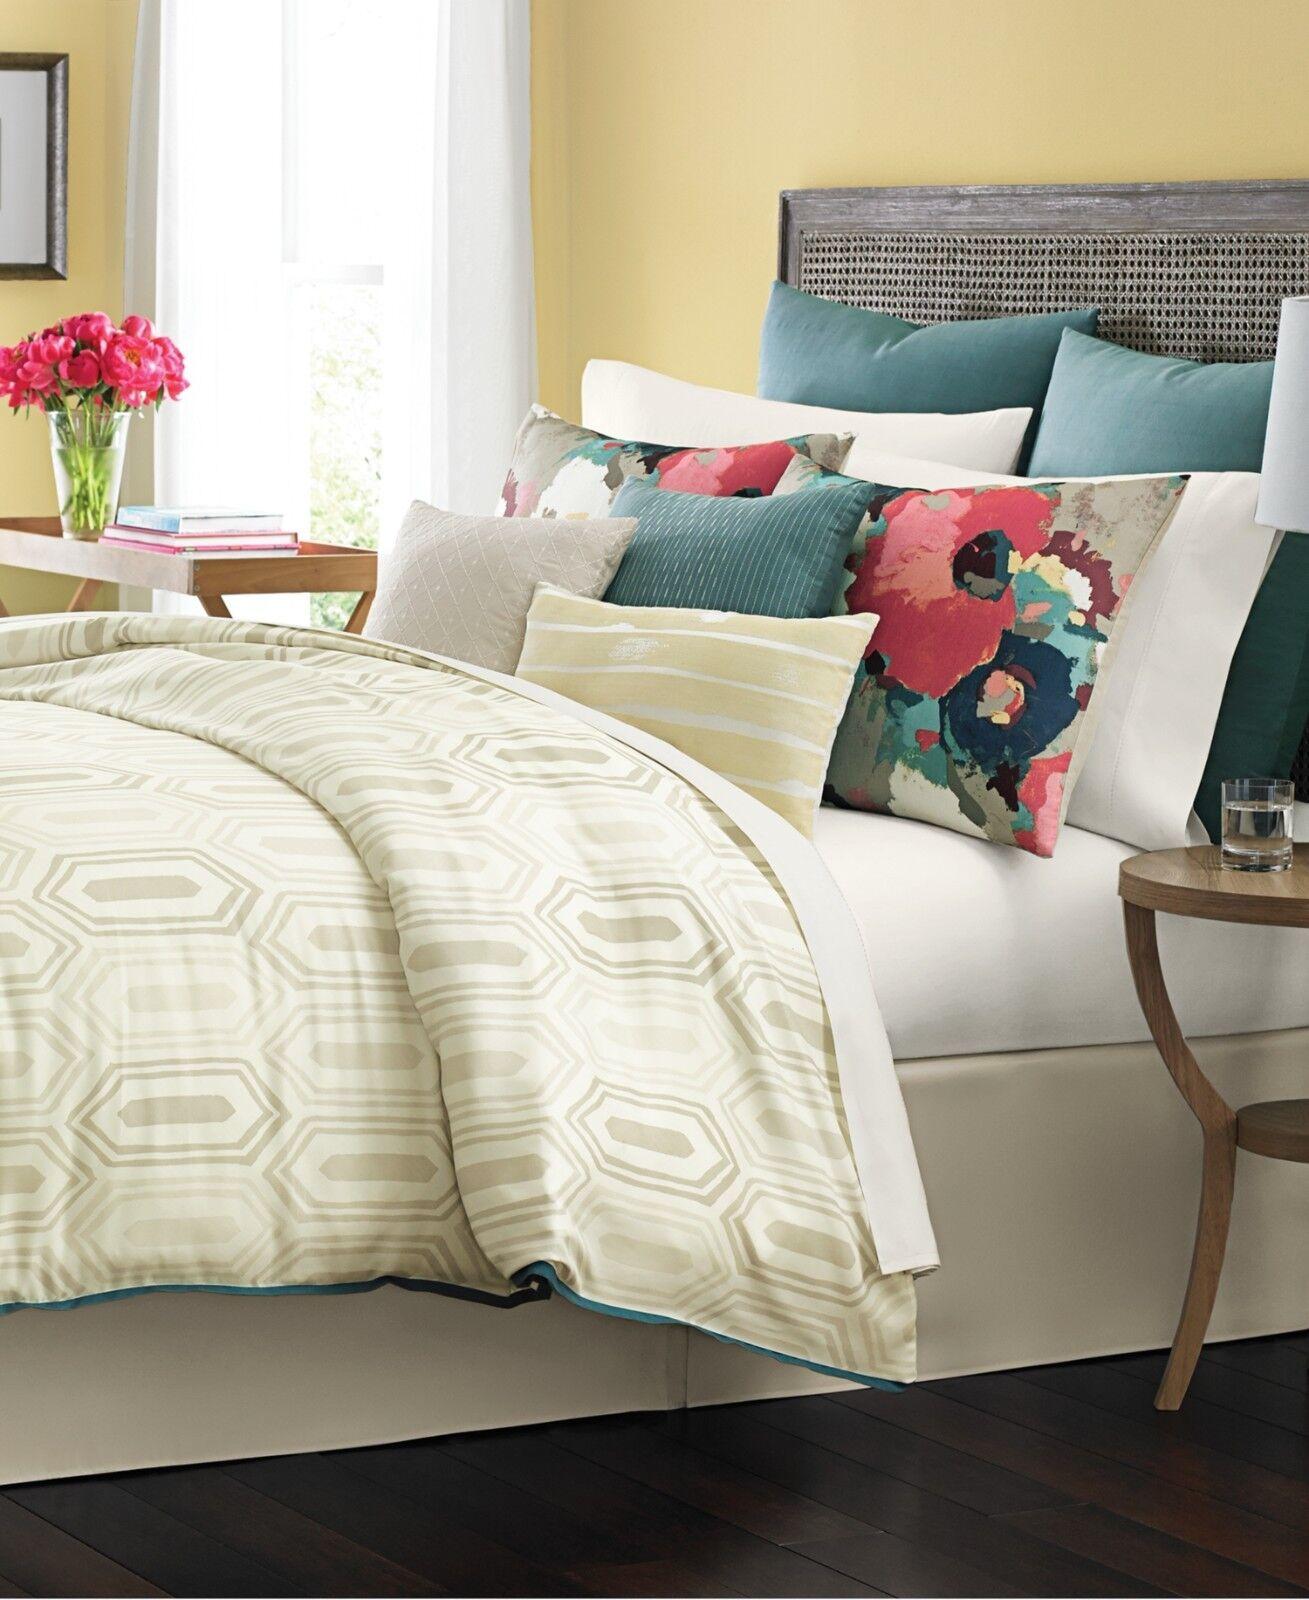 Martha Stewart Bedding Ellington 10-Pc CAL KING Comforter Set Beige F522